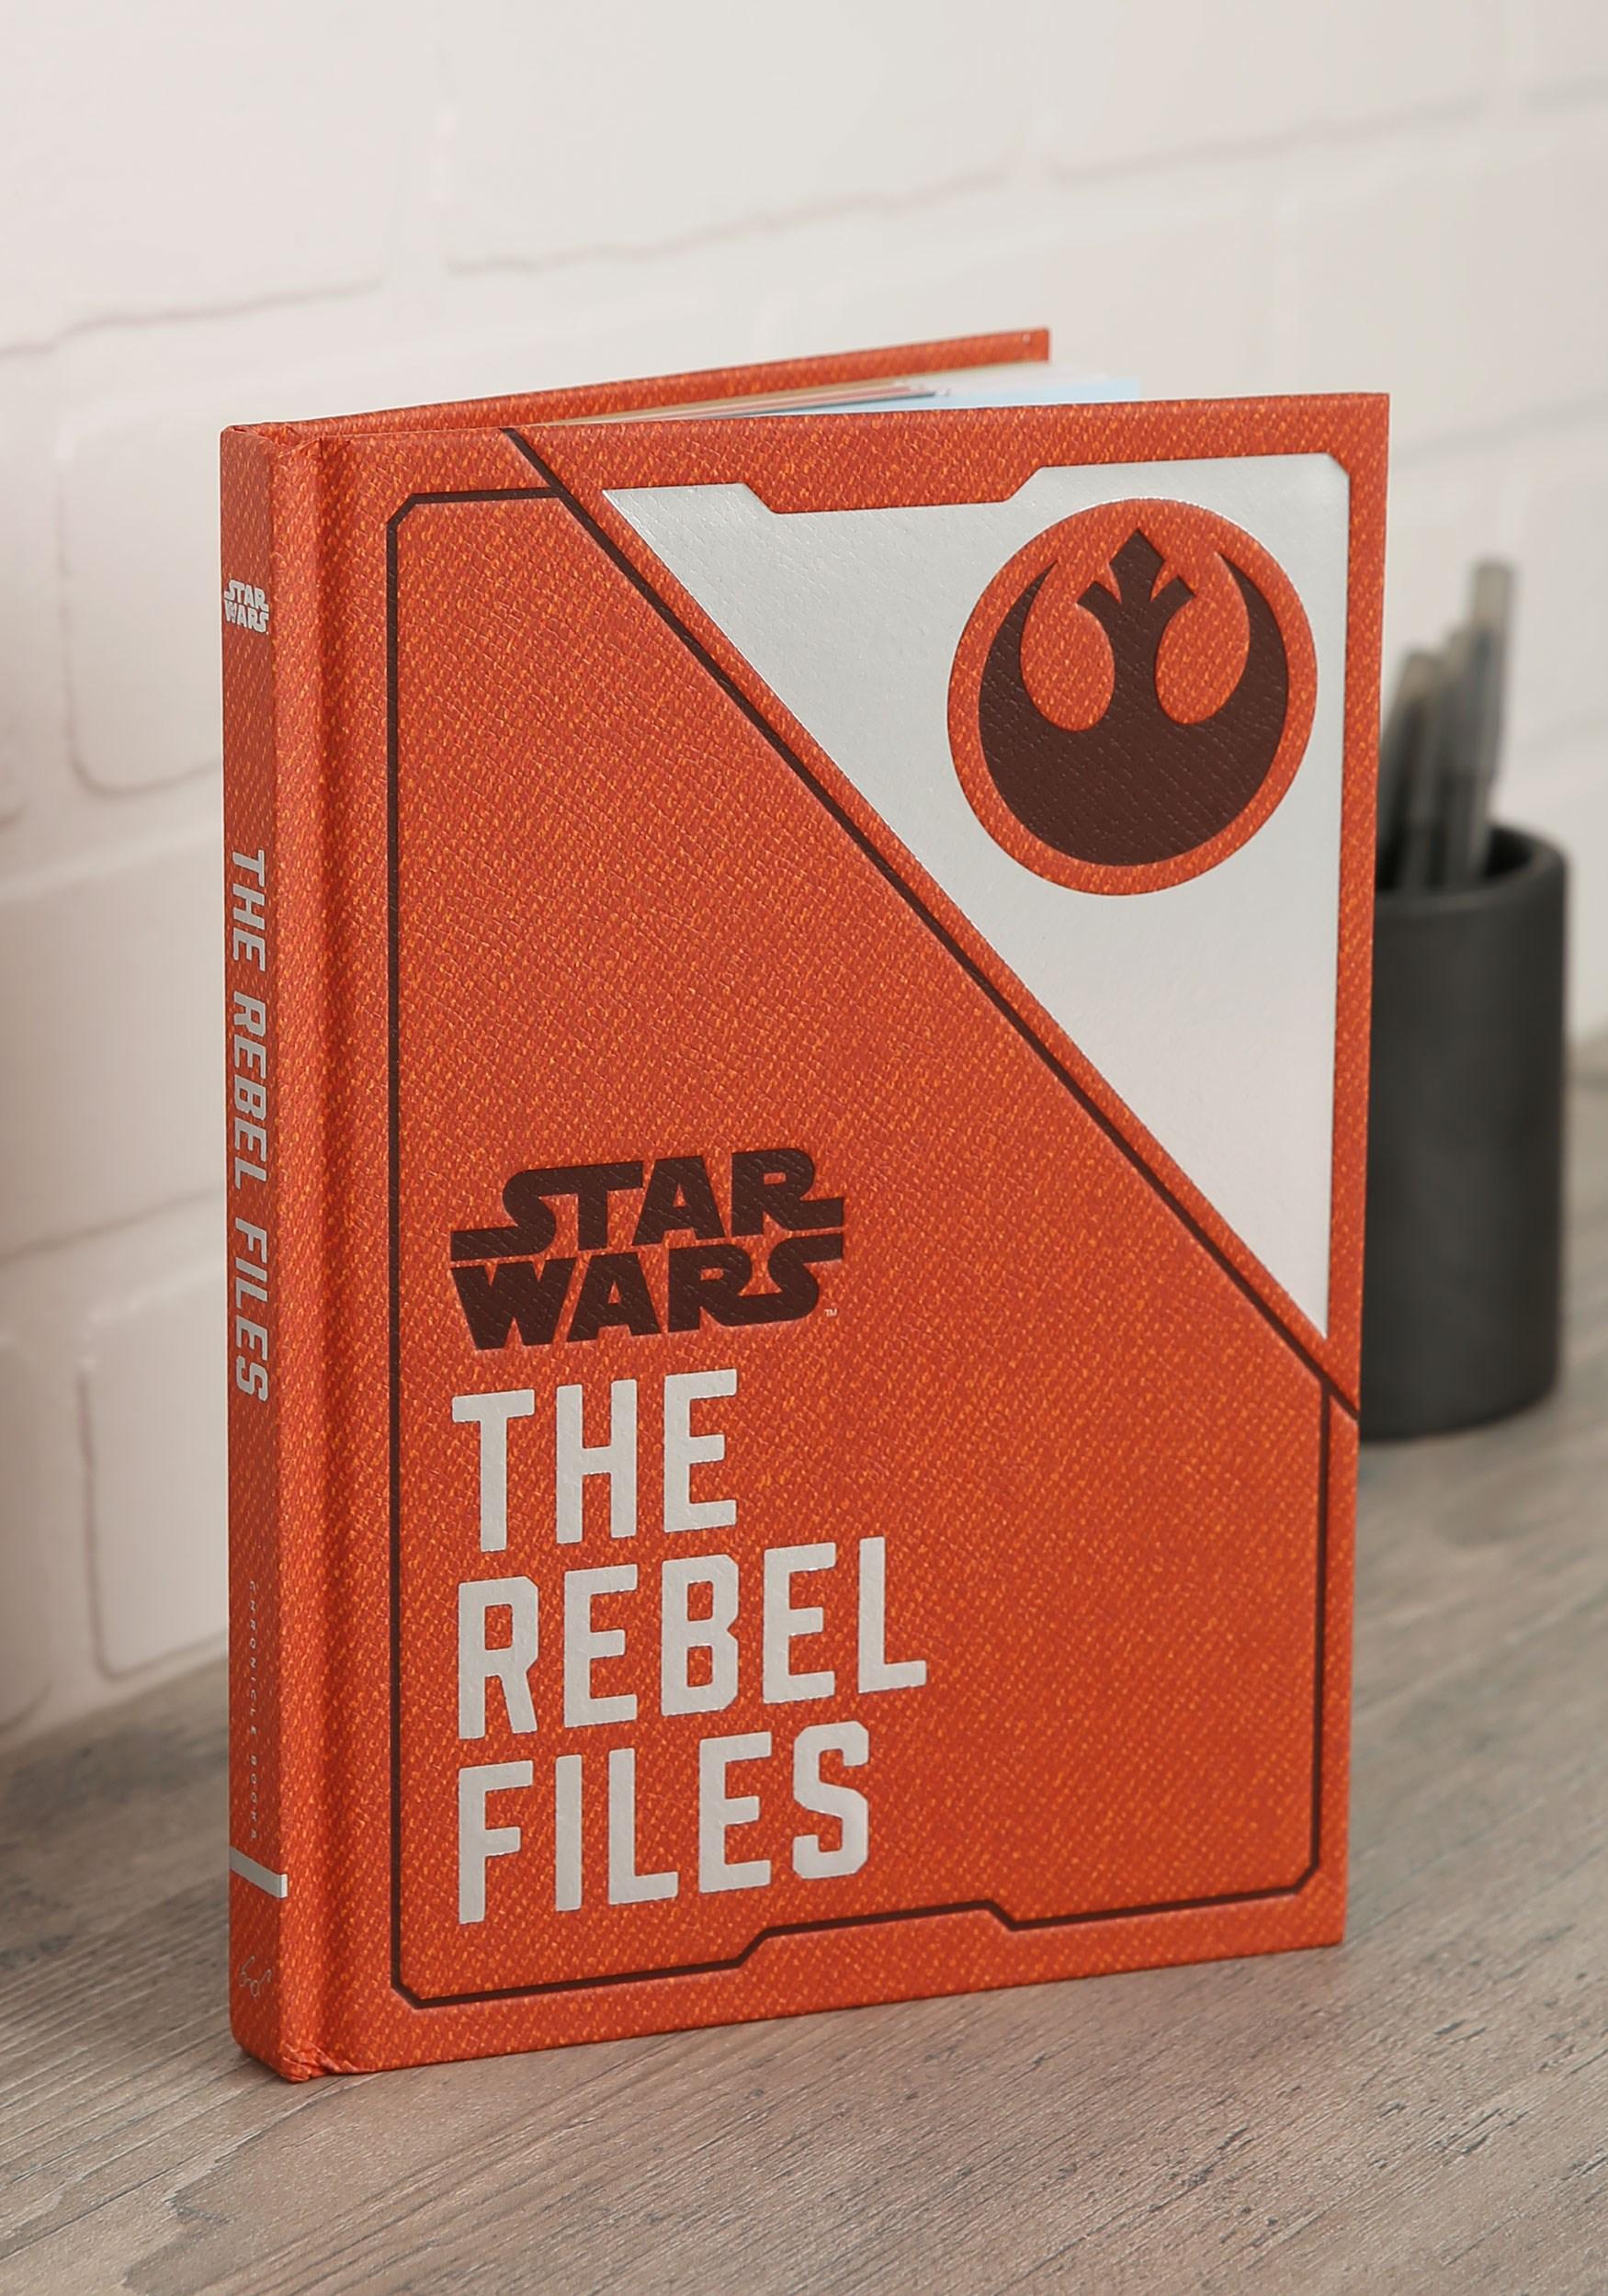 Star Wars: The Rebel Files Hardcover Book